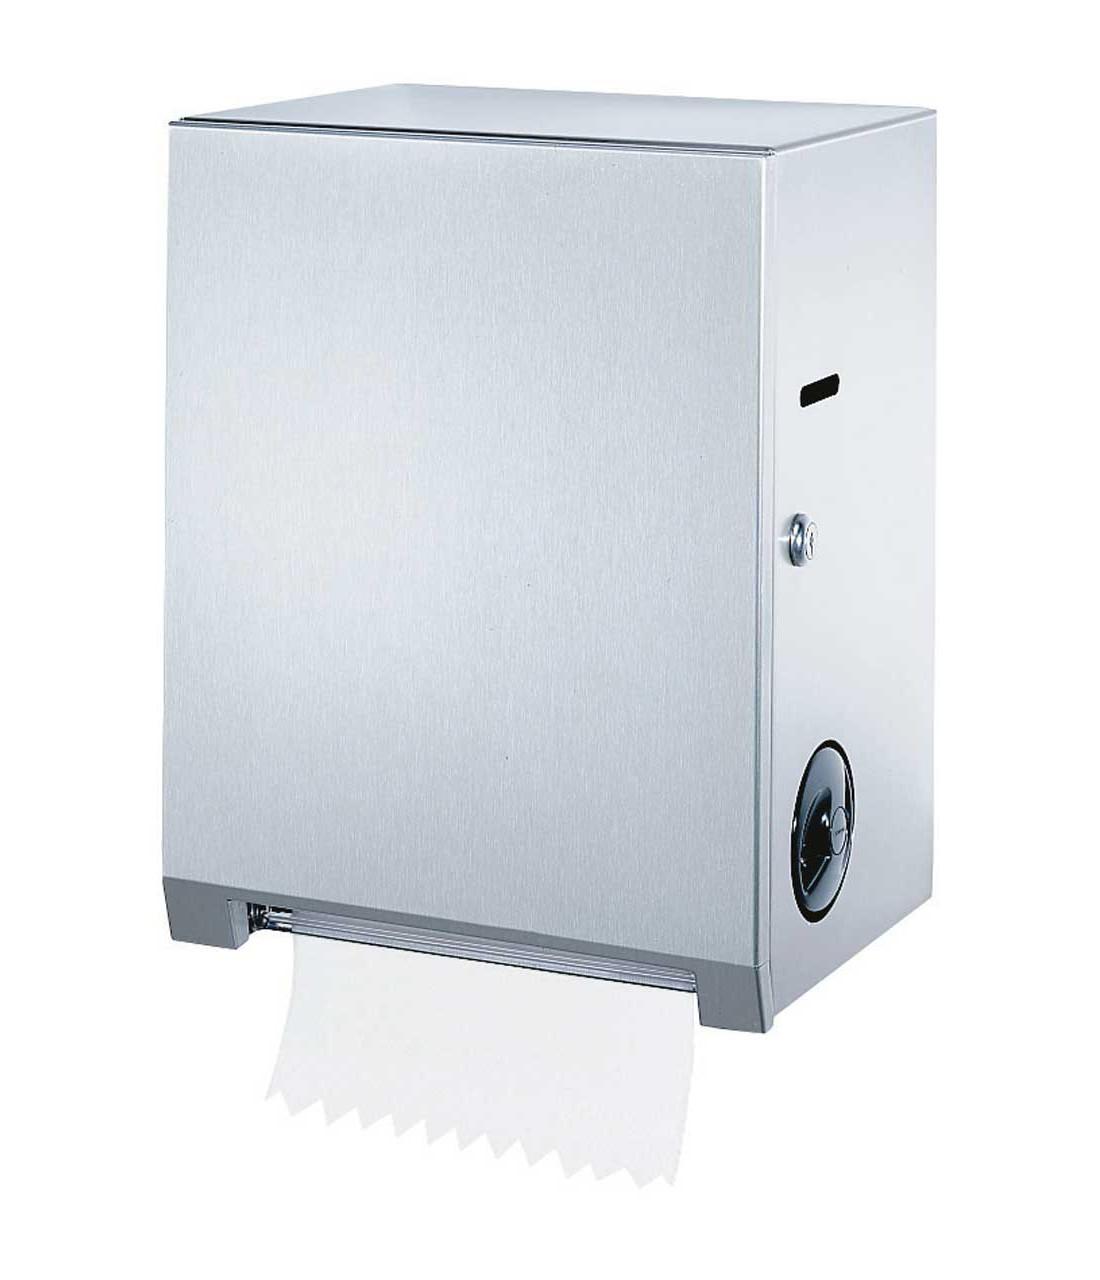 Bobrick Paper Towel Dispenser B2860 Trifold